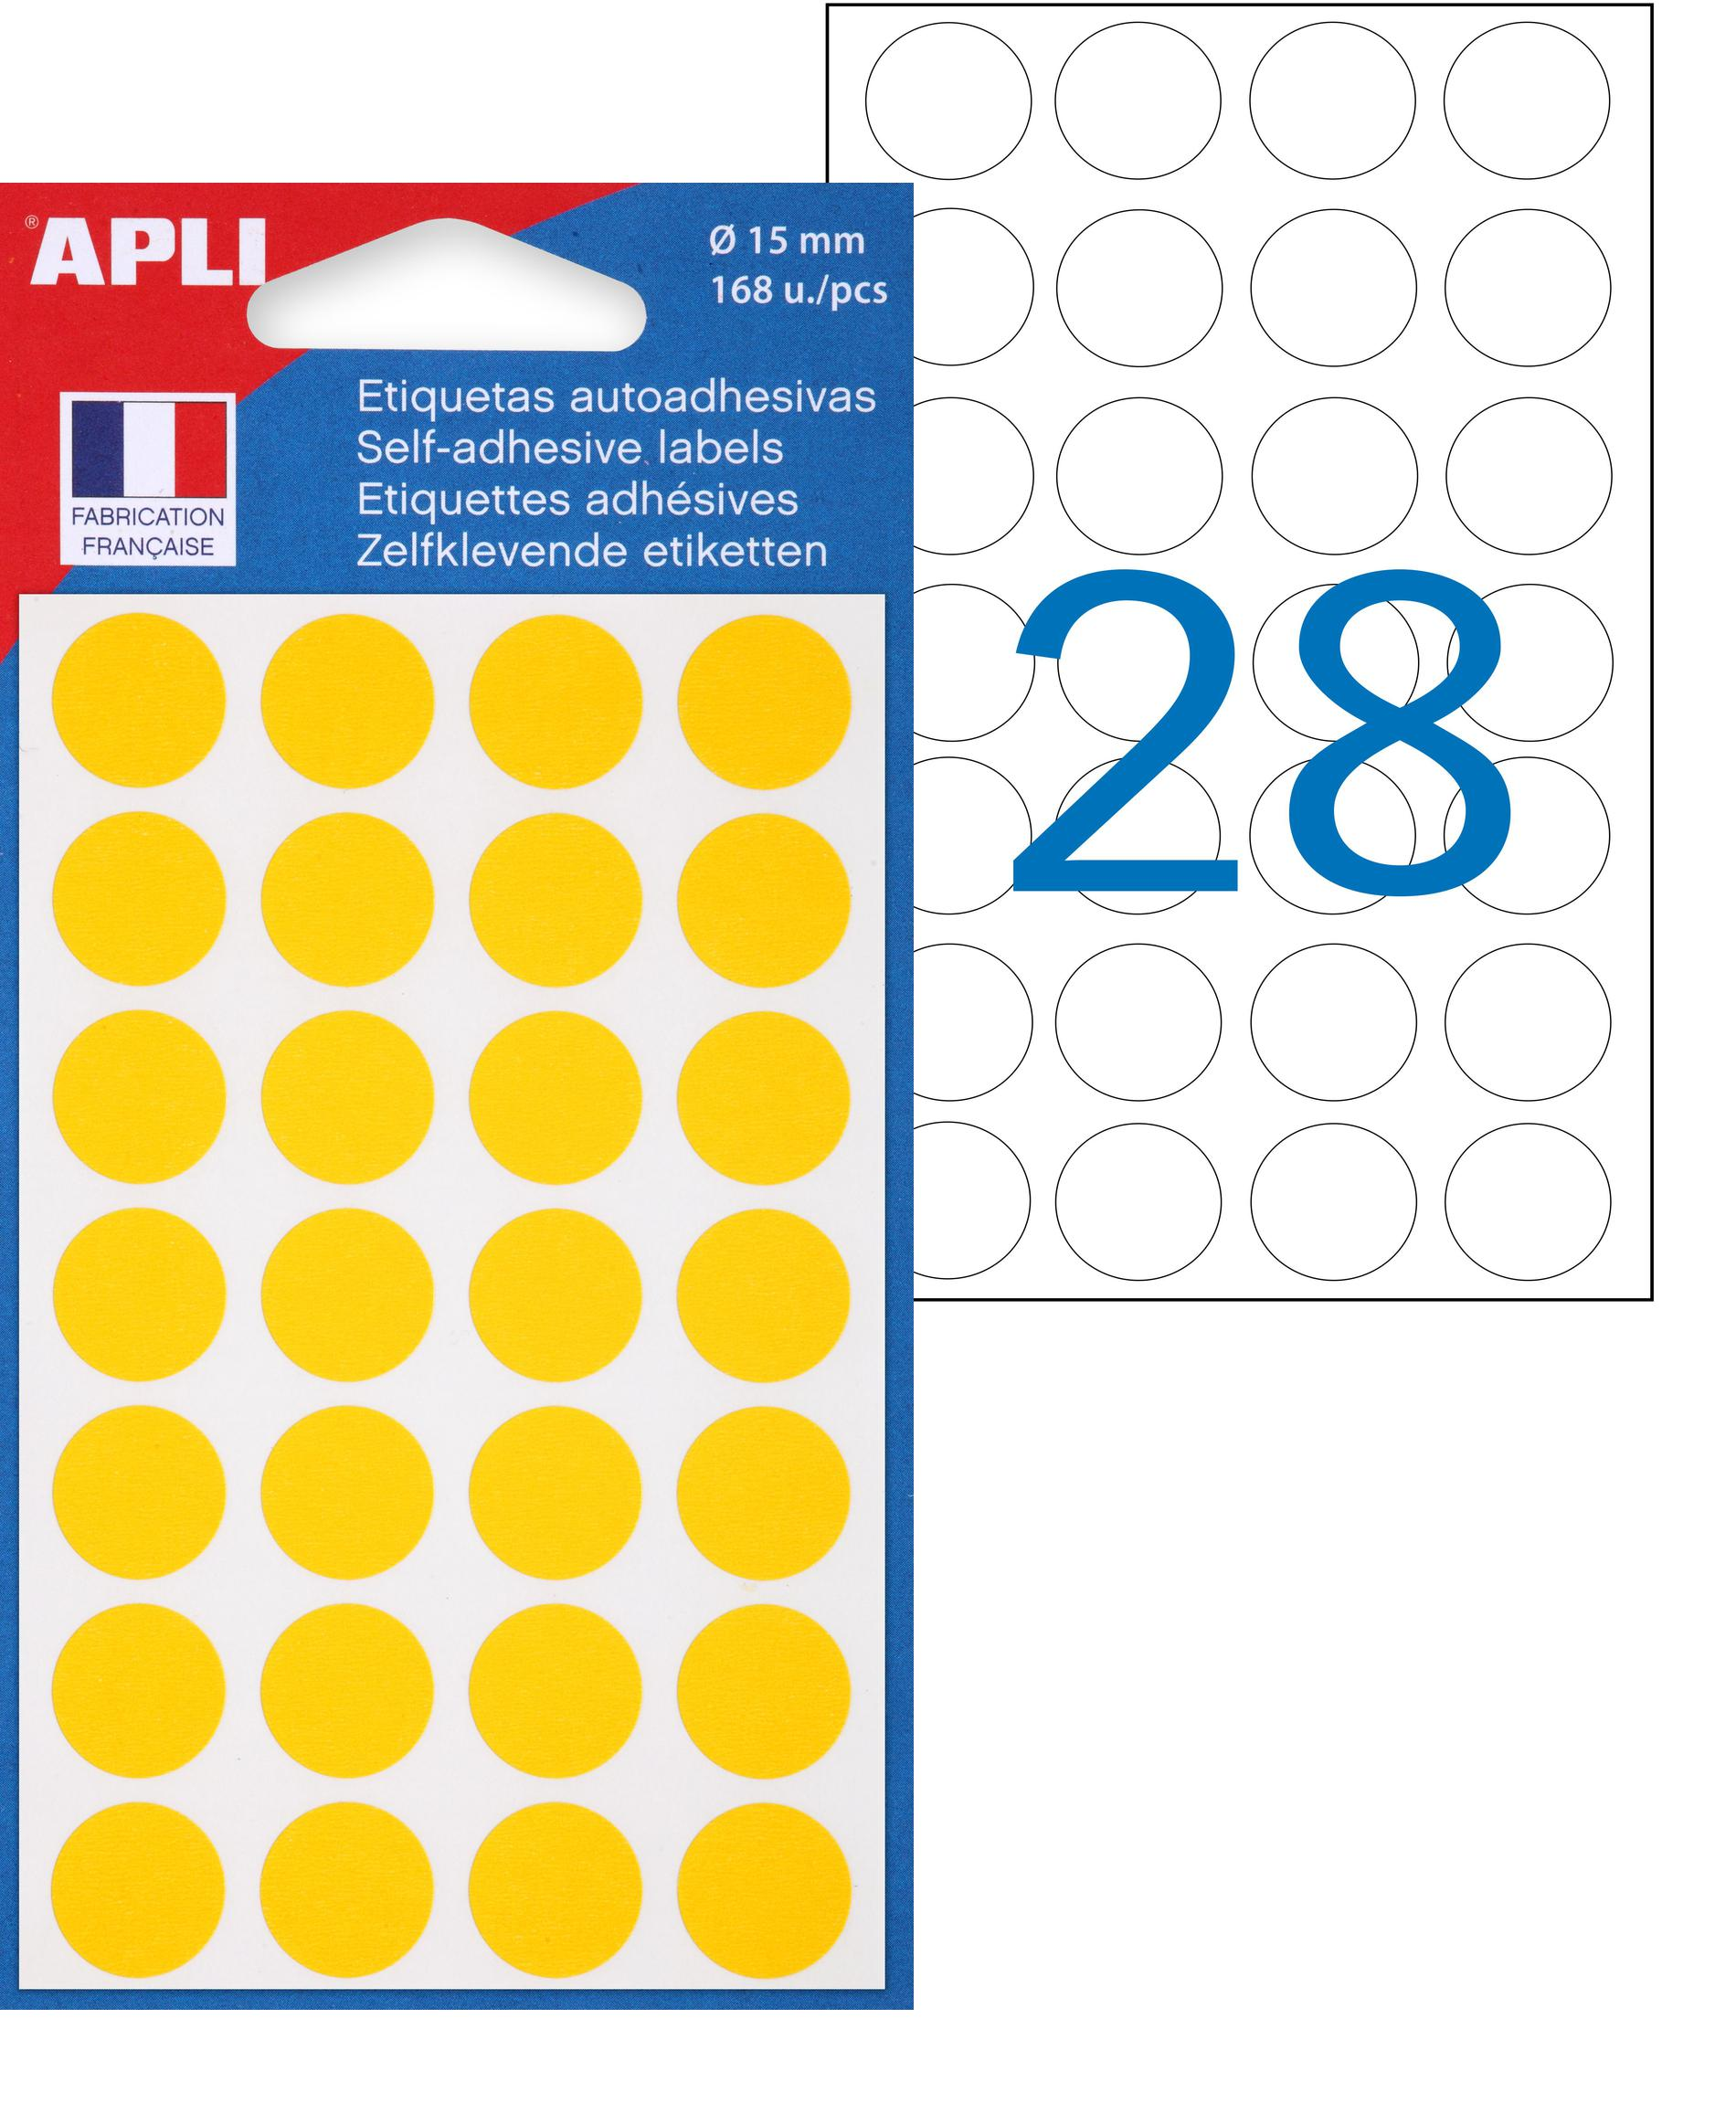 Apli Agipa - 168 Pastilles adhésives - jaune - diamètre 15 mm - réf 111844